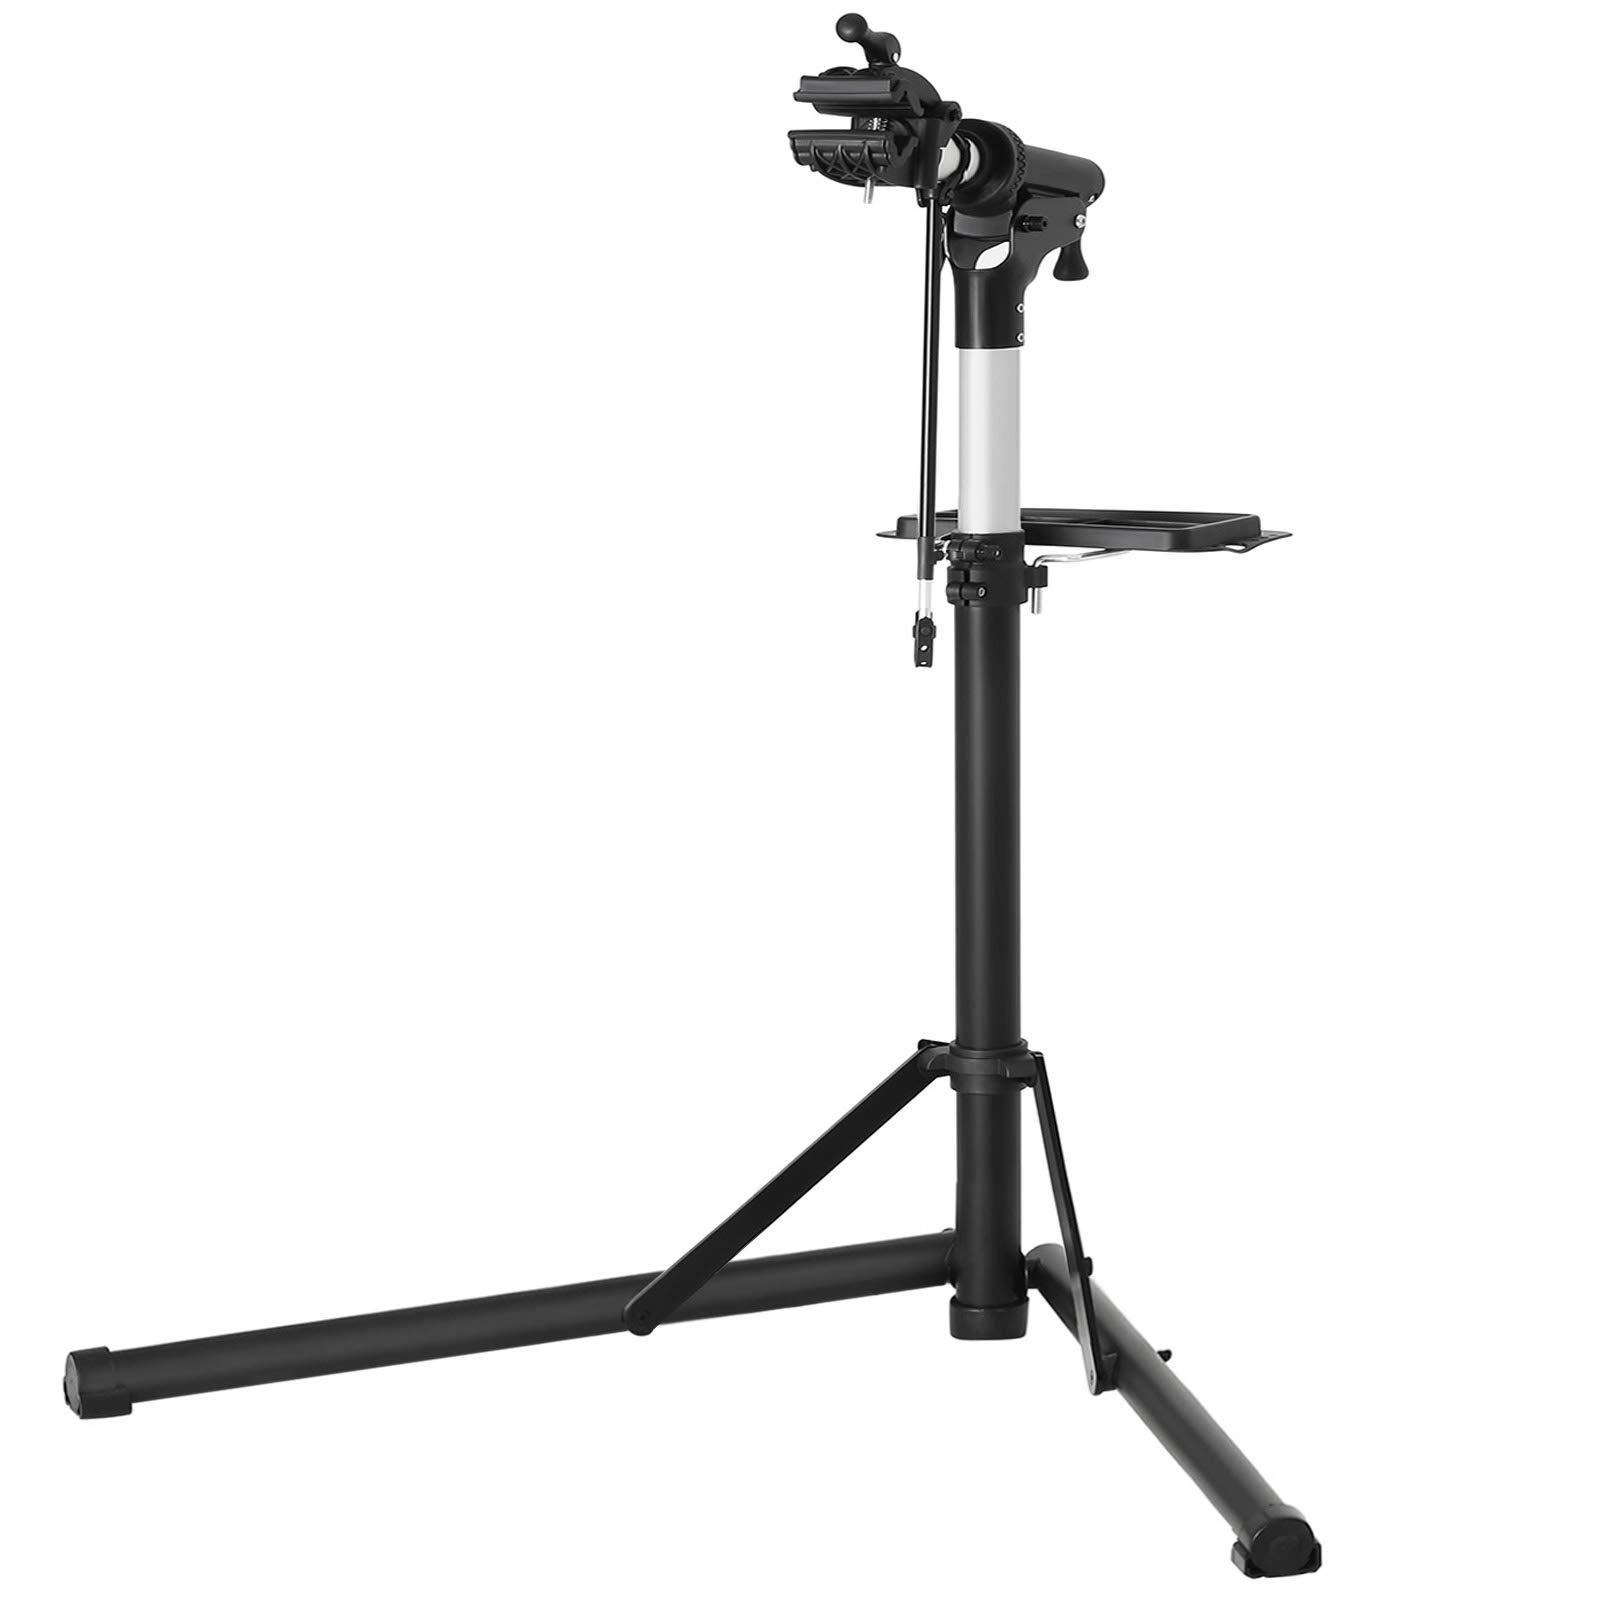 SONGMICS Bike Repair Stand Rack, Portable USBR04B by SONGMICS